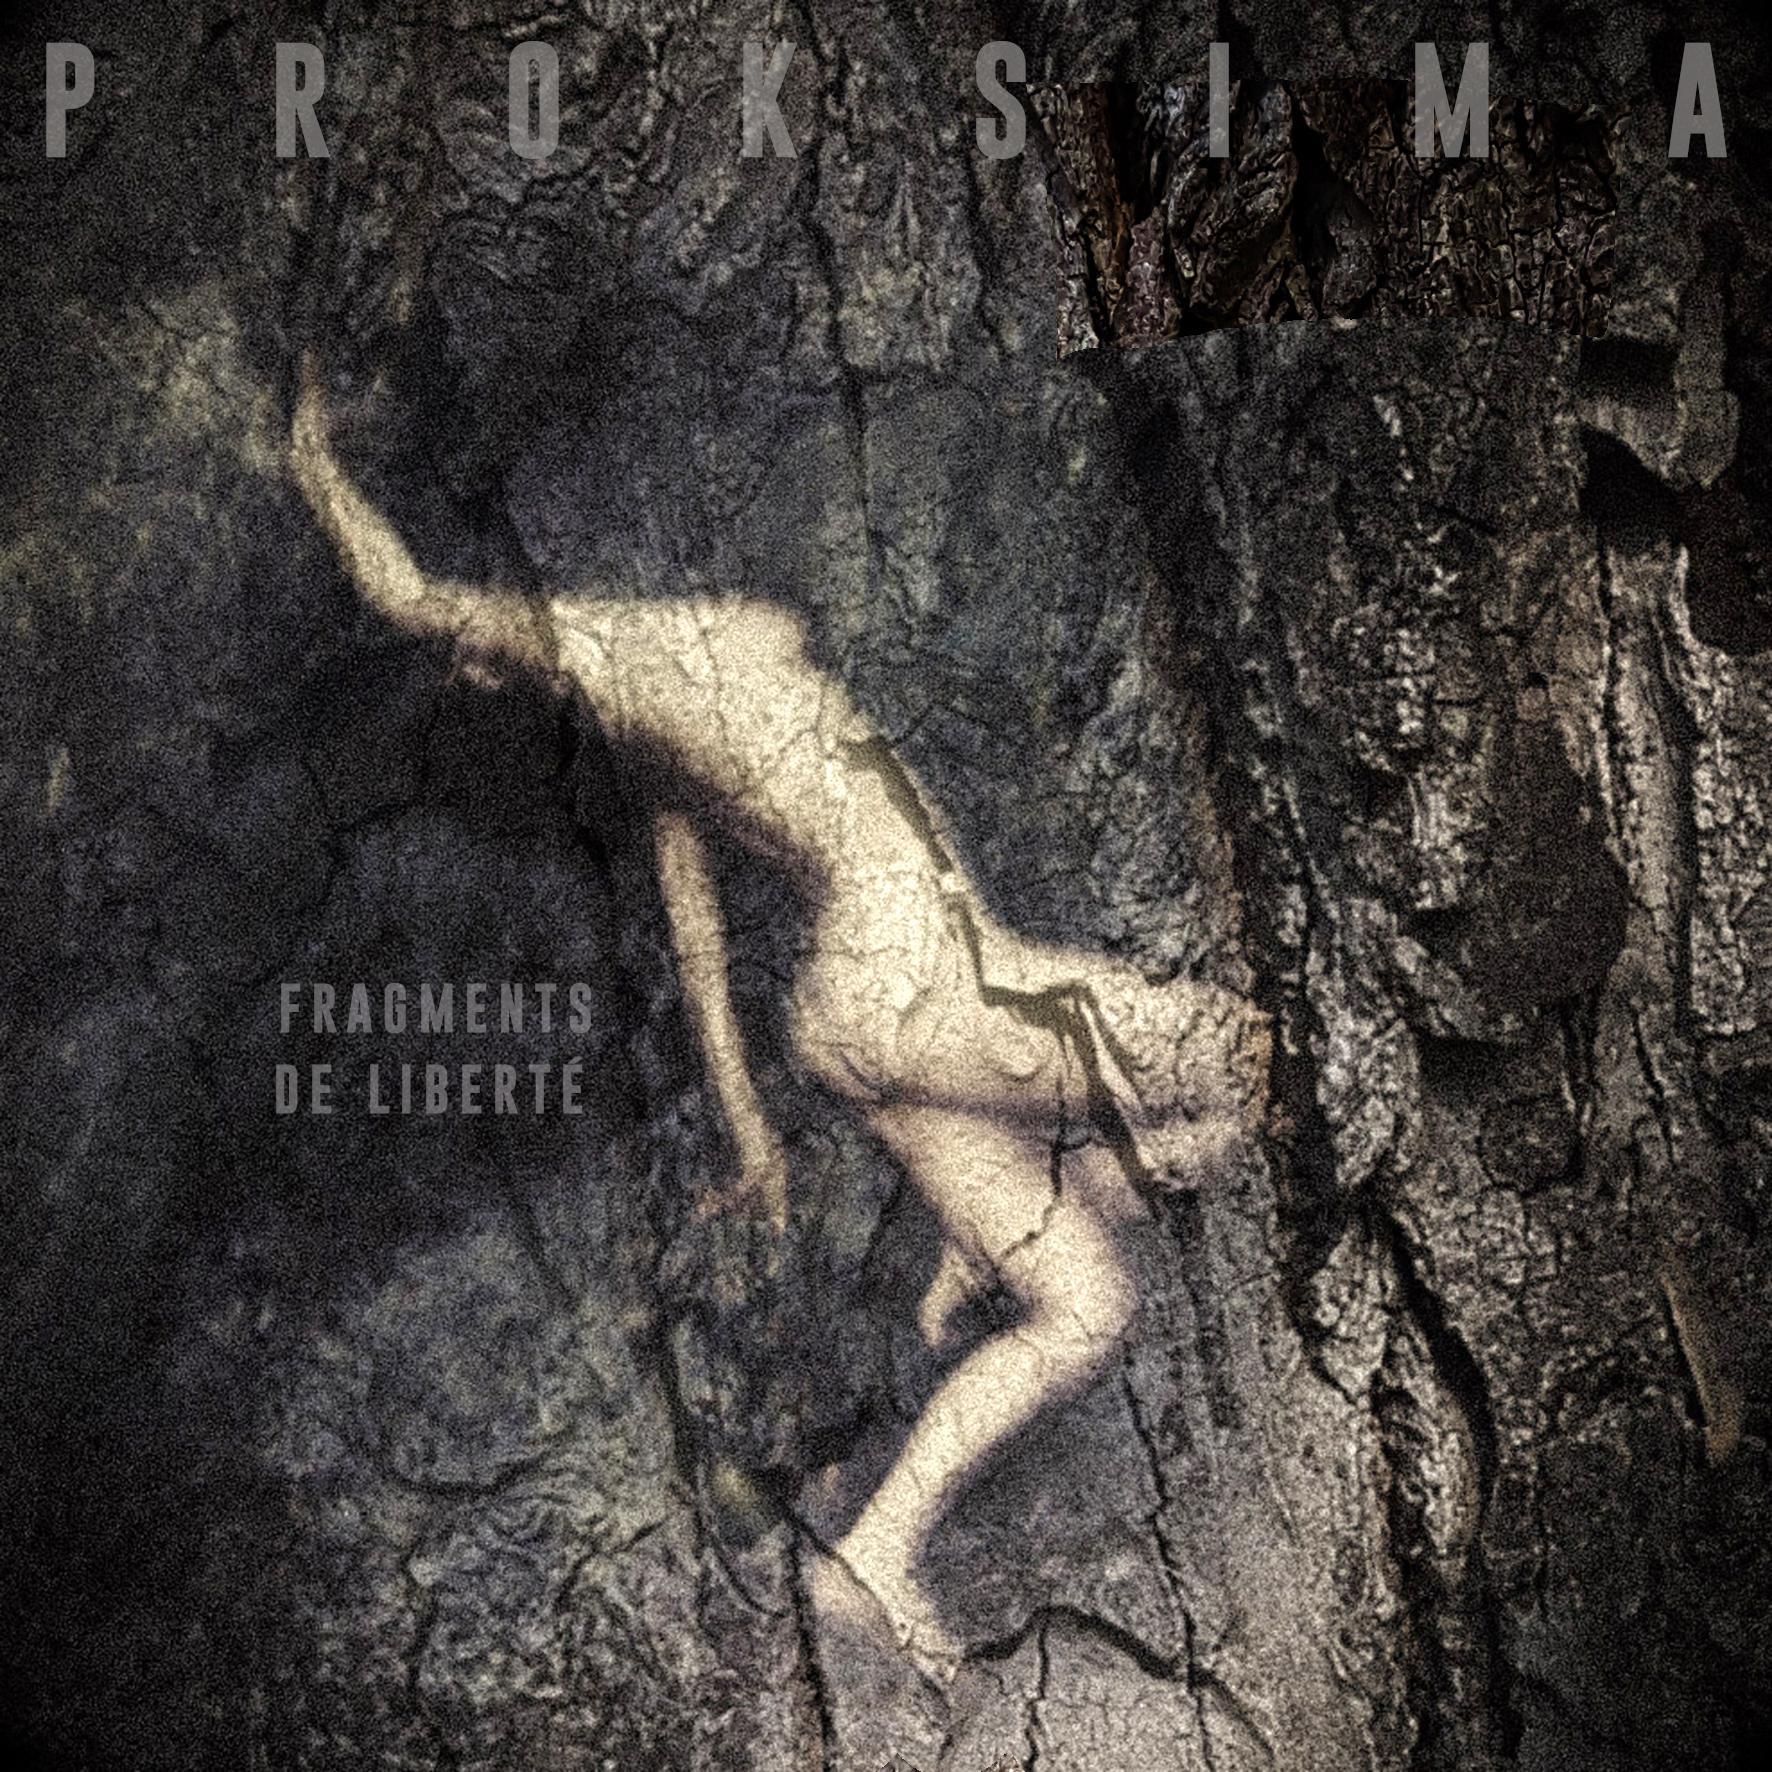 Proksima – Fragments de Liberté